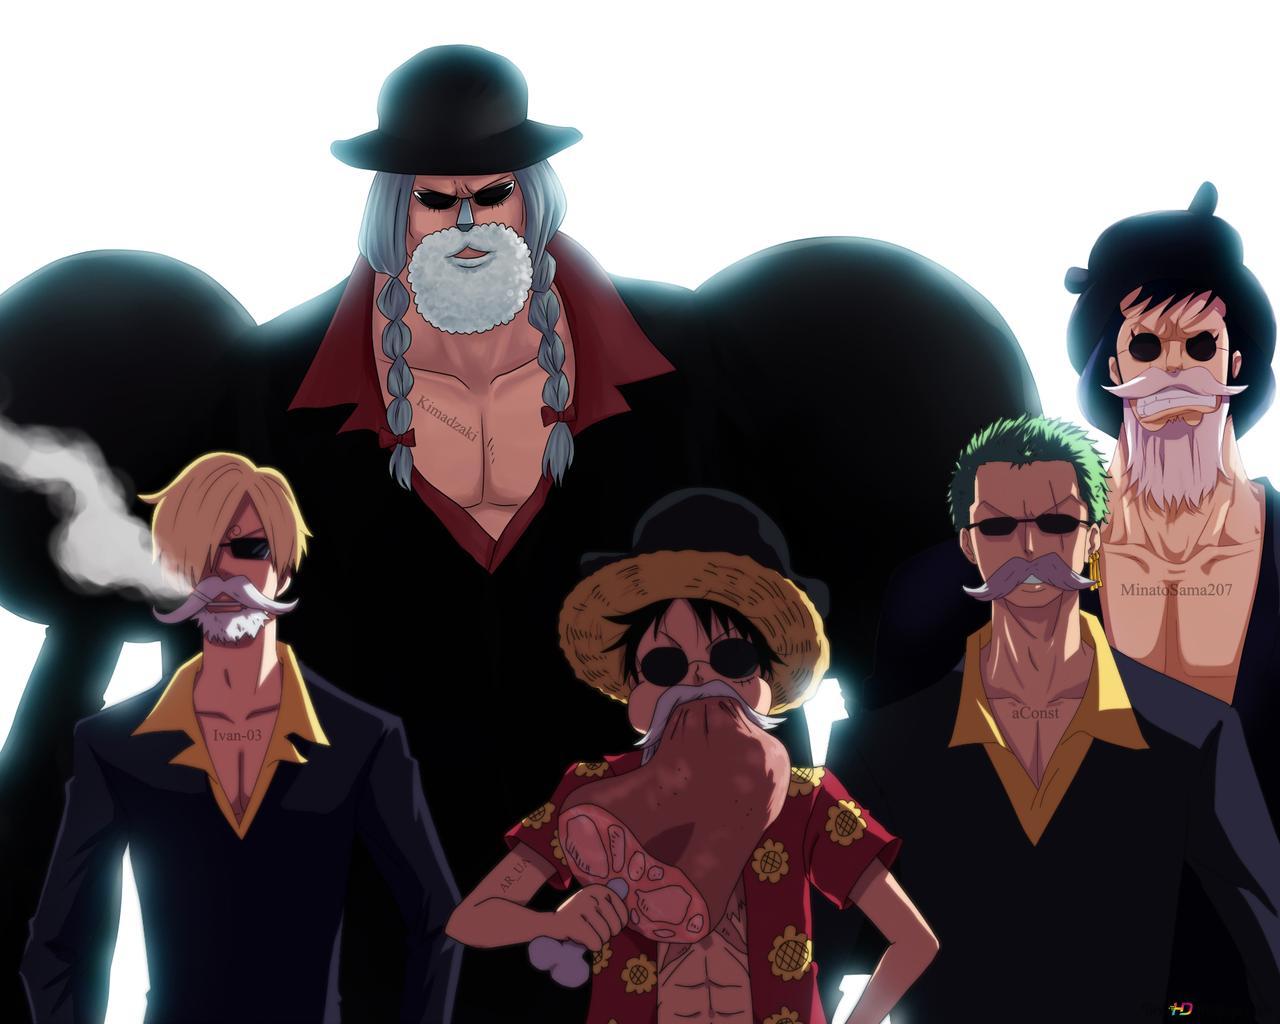 One Piece Monkey D Luffy Roronoa Zoro Sanji Kin Emon Franky Hd Wallpaper Download